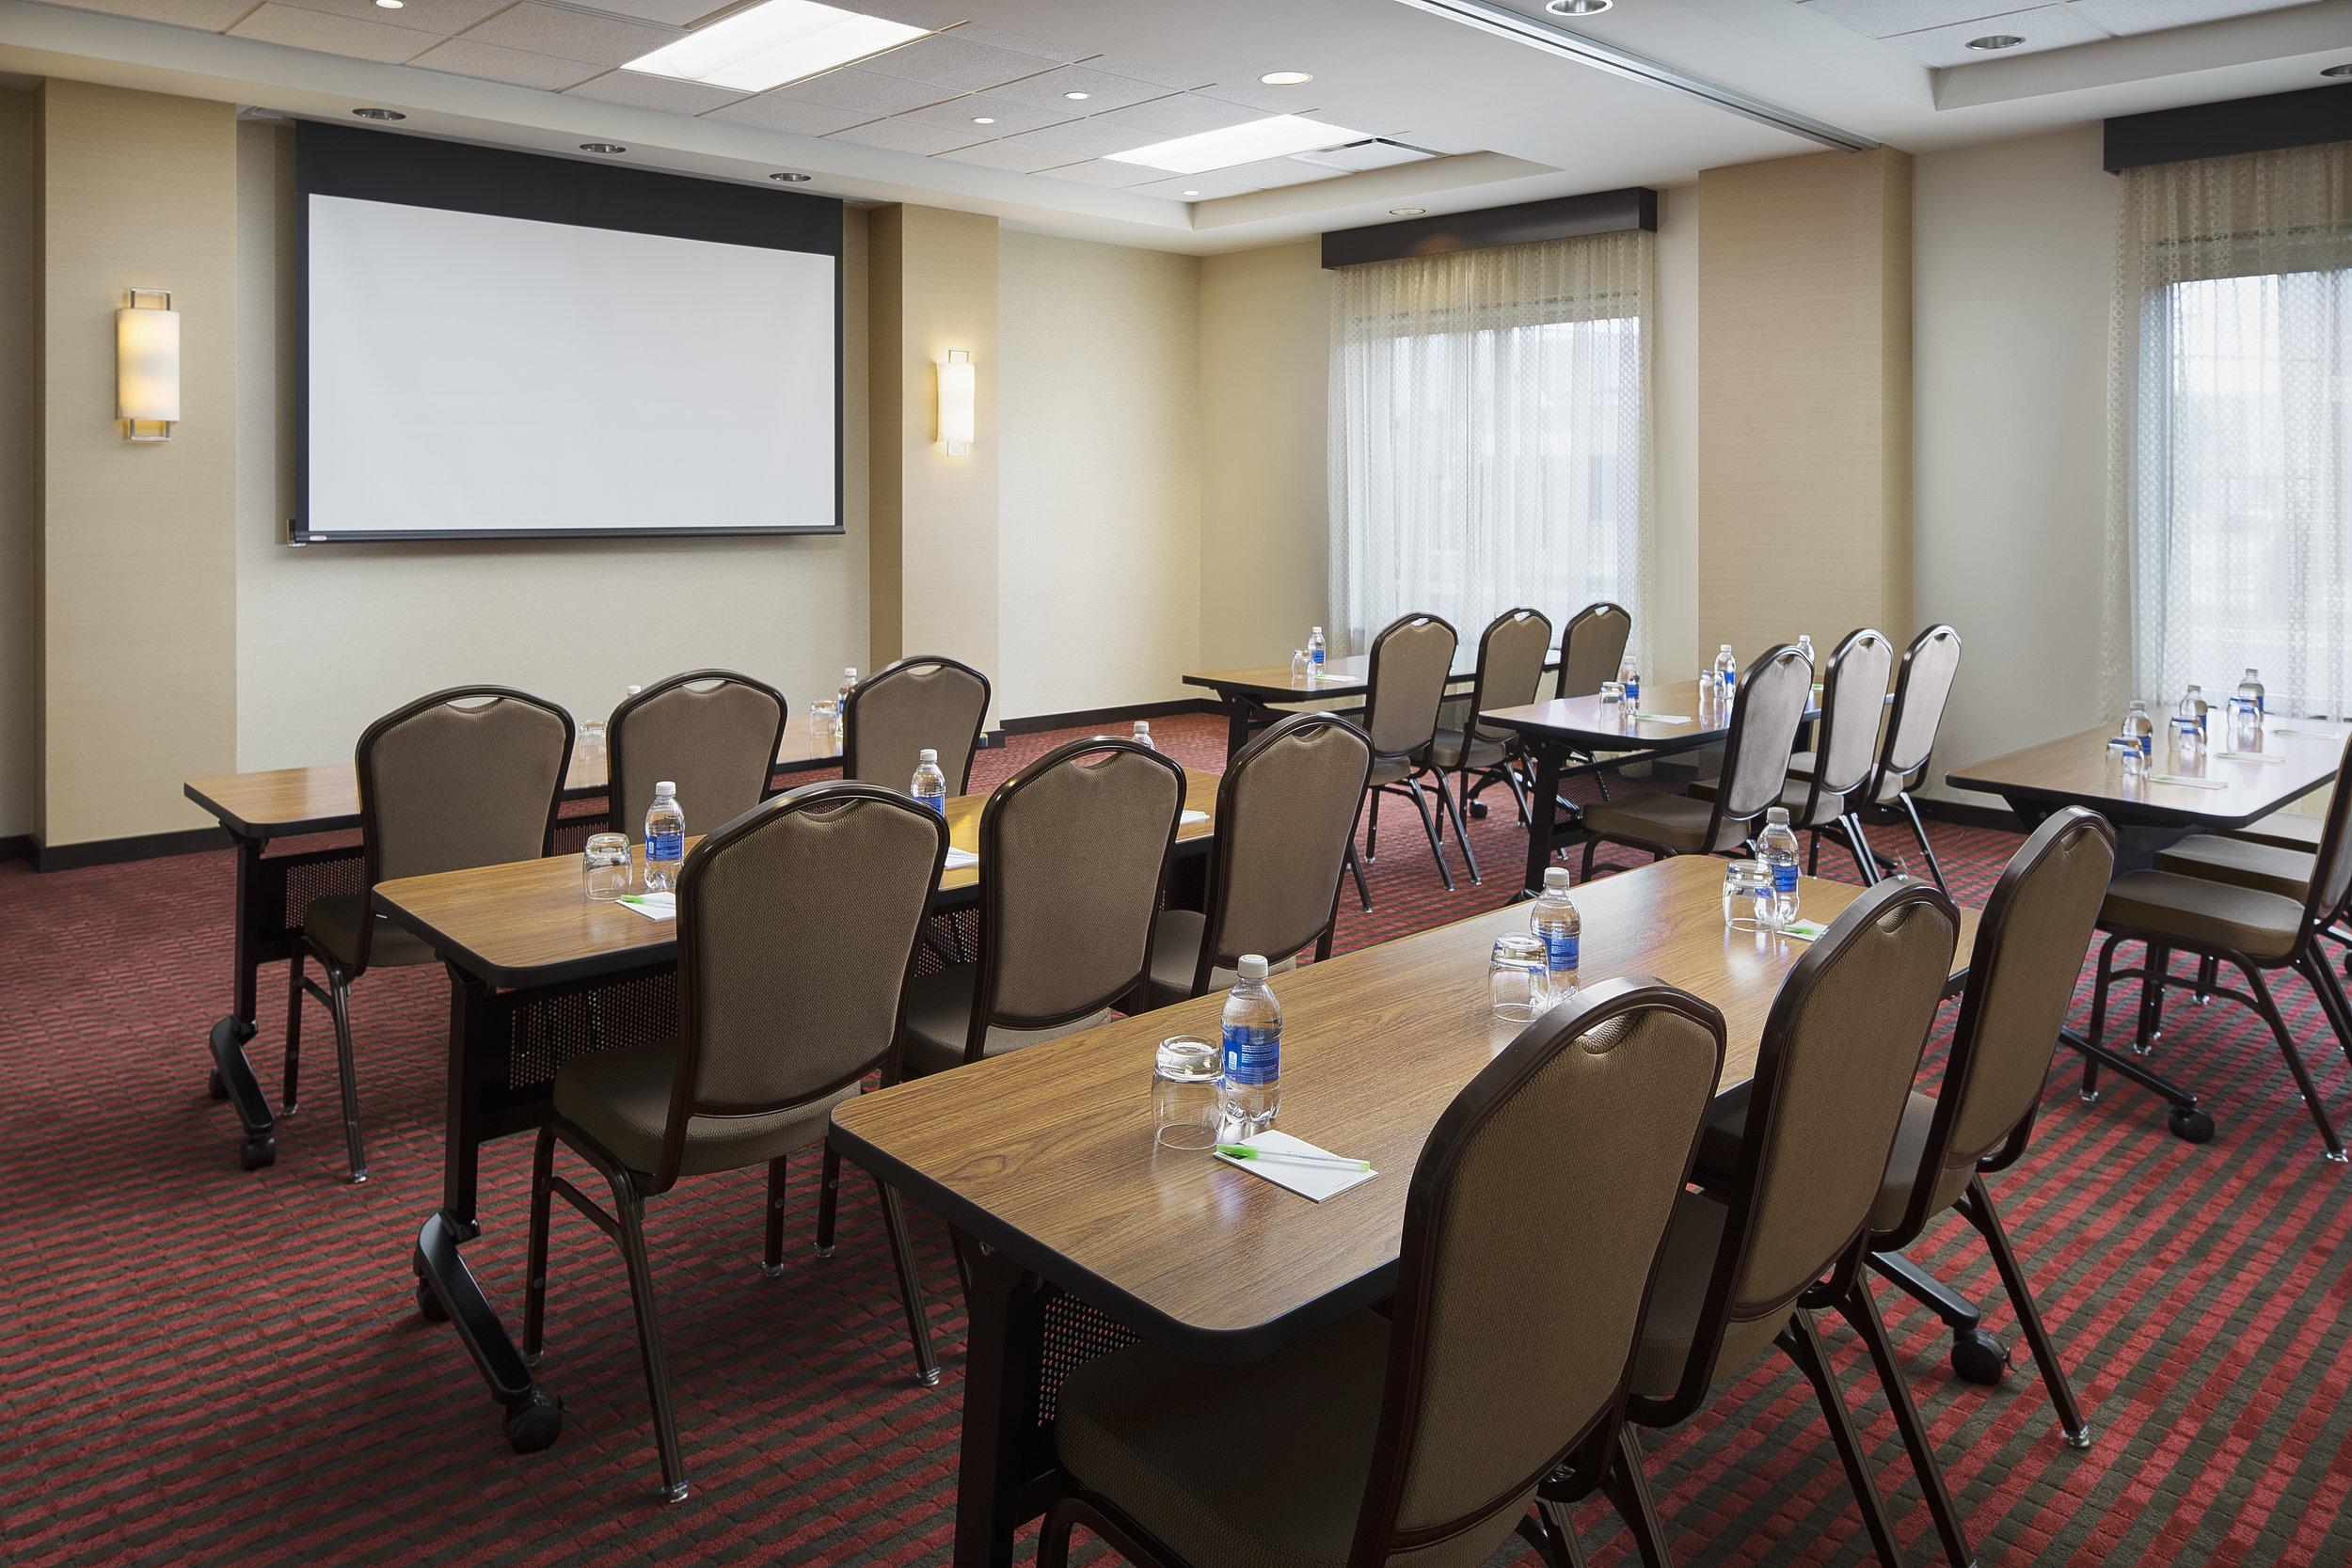 CHIZM_MeetingA.jpg